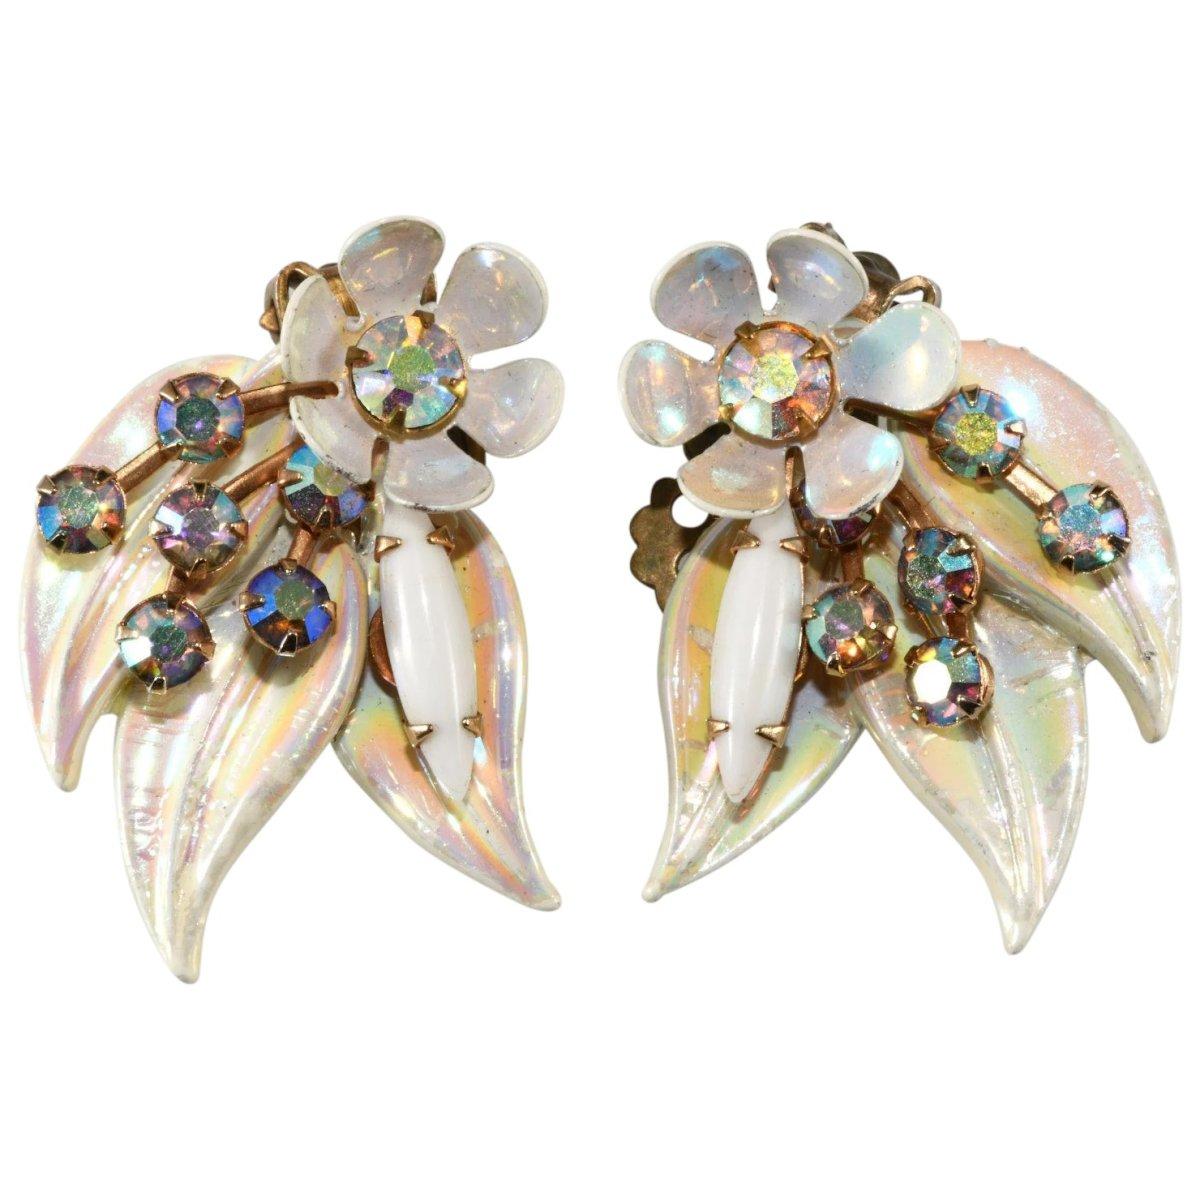 Selini enameled earrings